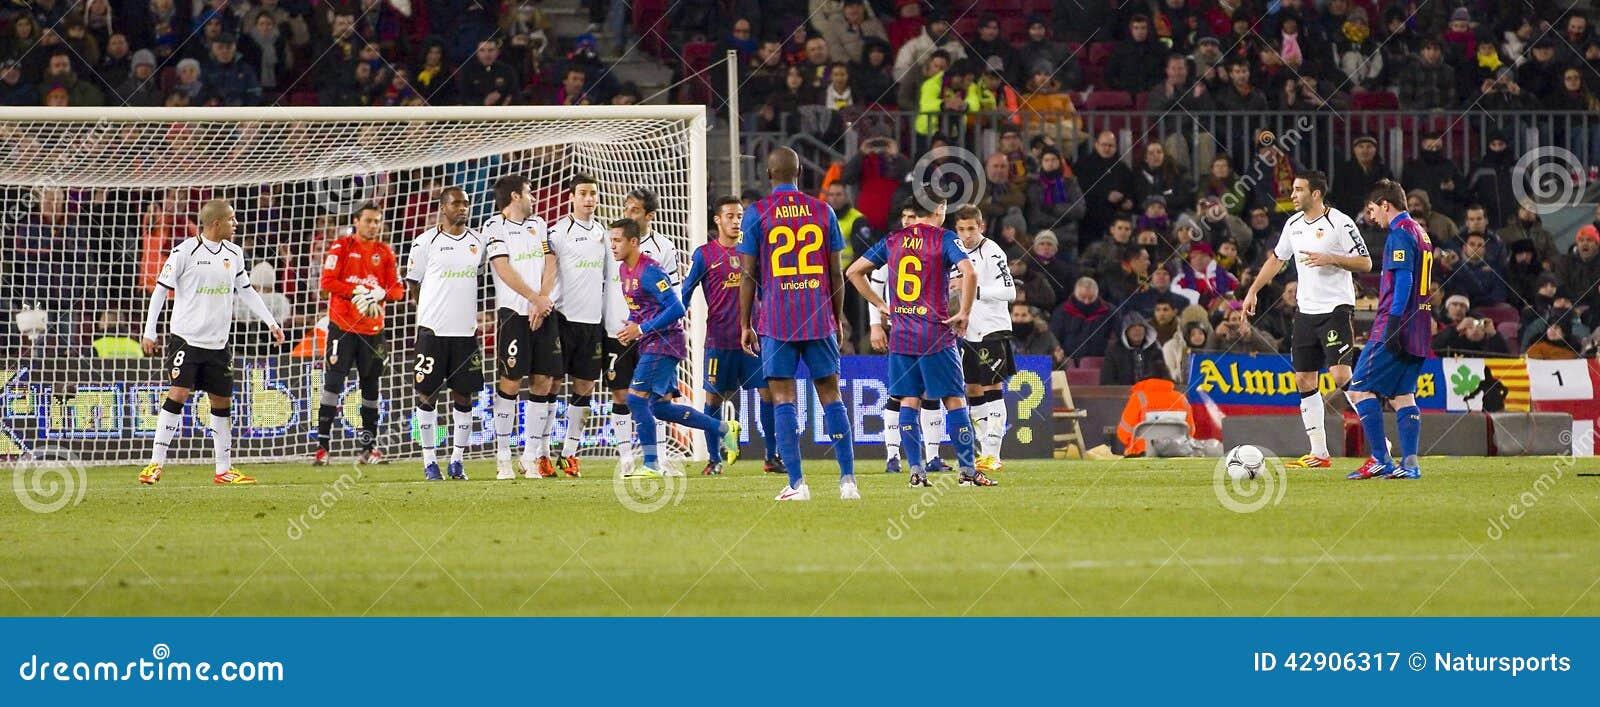 Football Free Kick Editorial Photography - Image: 42906317